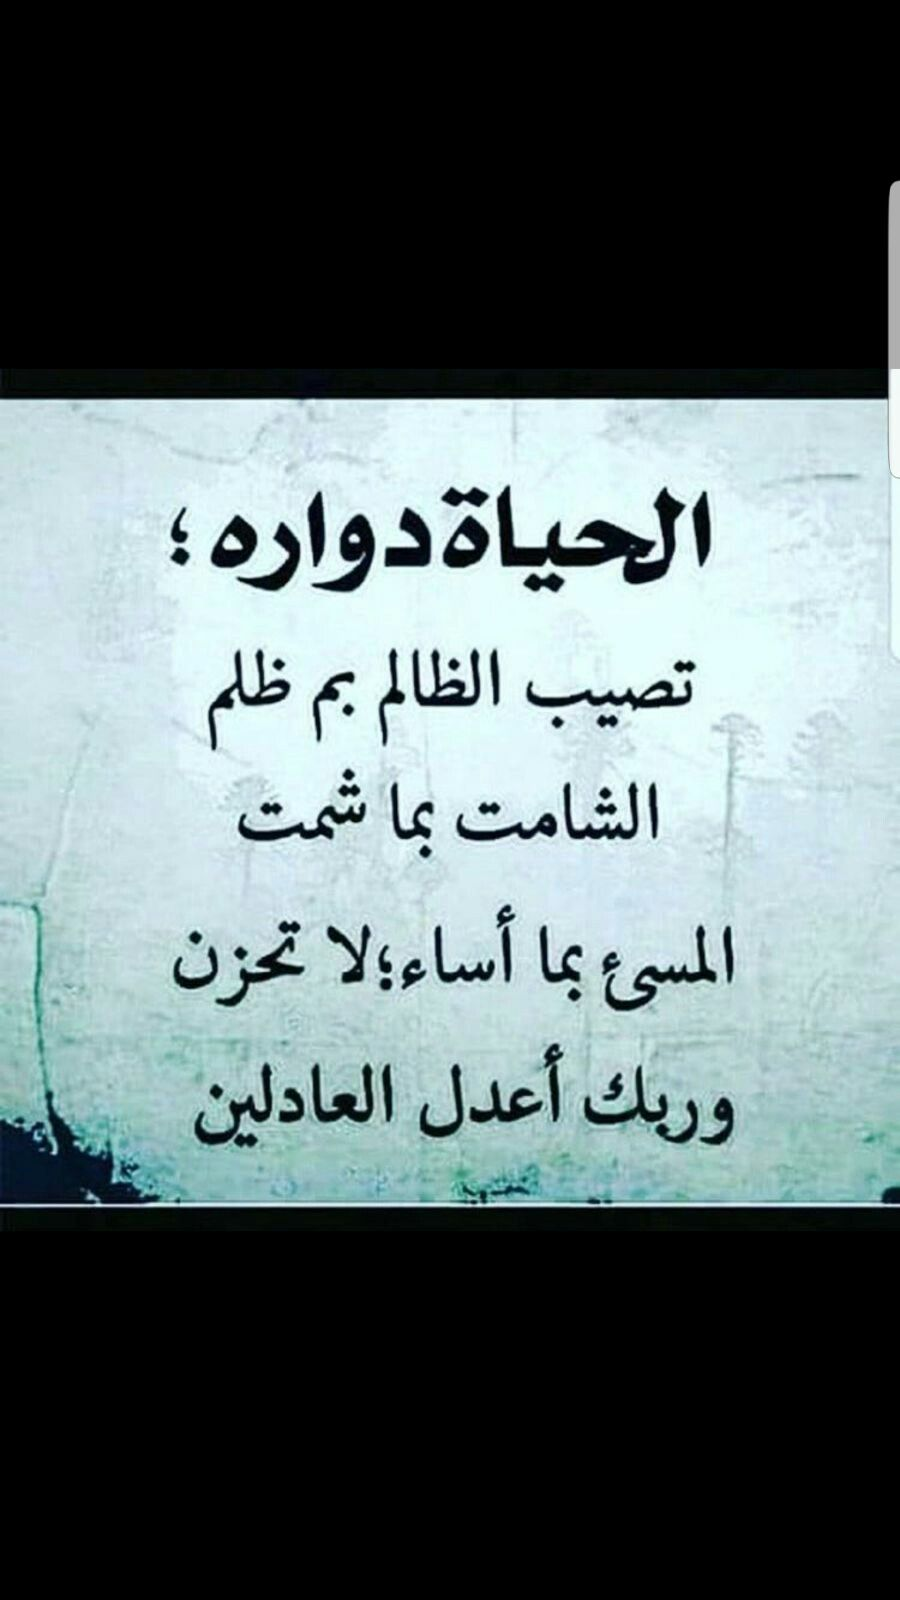 Pin By Toufik Zaid On مقهى احلى الكلمات و بريق حروفها Morning Quotes Islam Beliefs Quotes